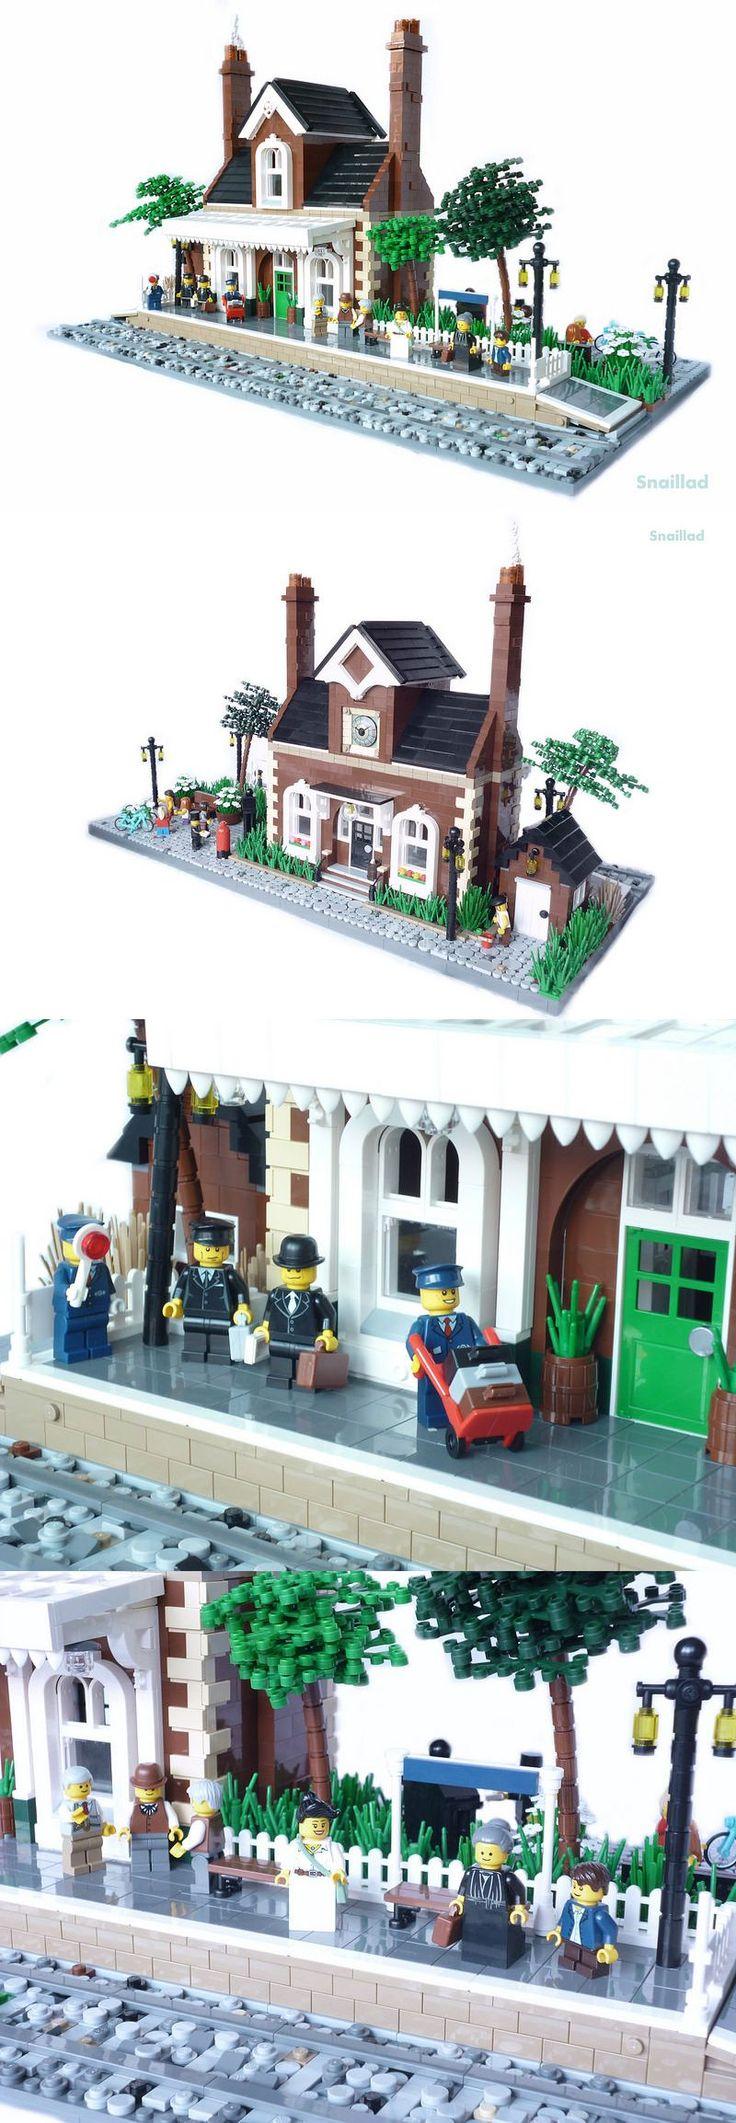 Studdington Station #LEGO #Train #Station